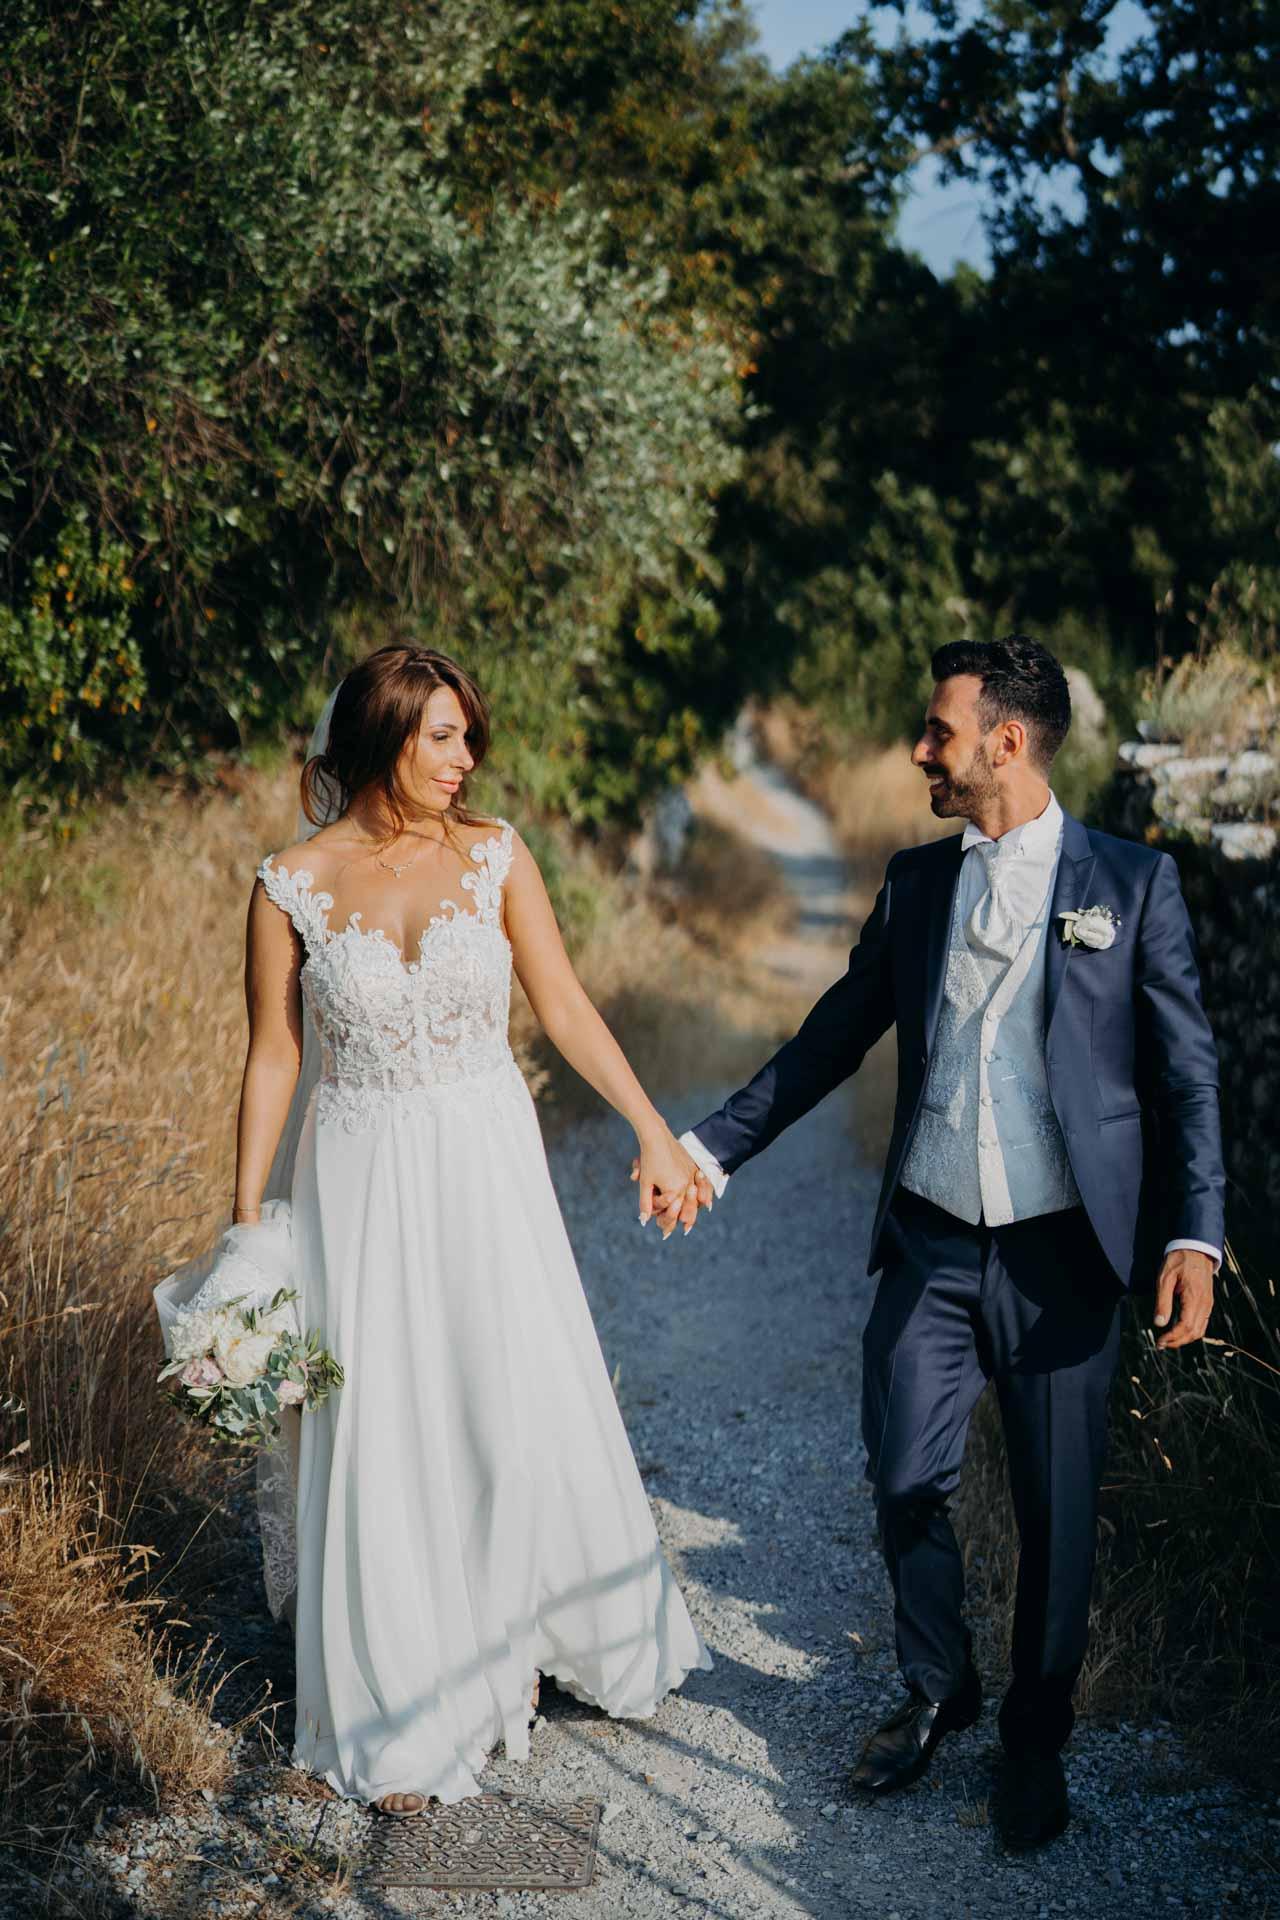 fotografo_matrimonio_toscana_poggio_tondo_72